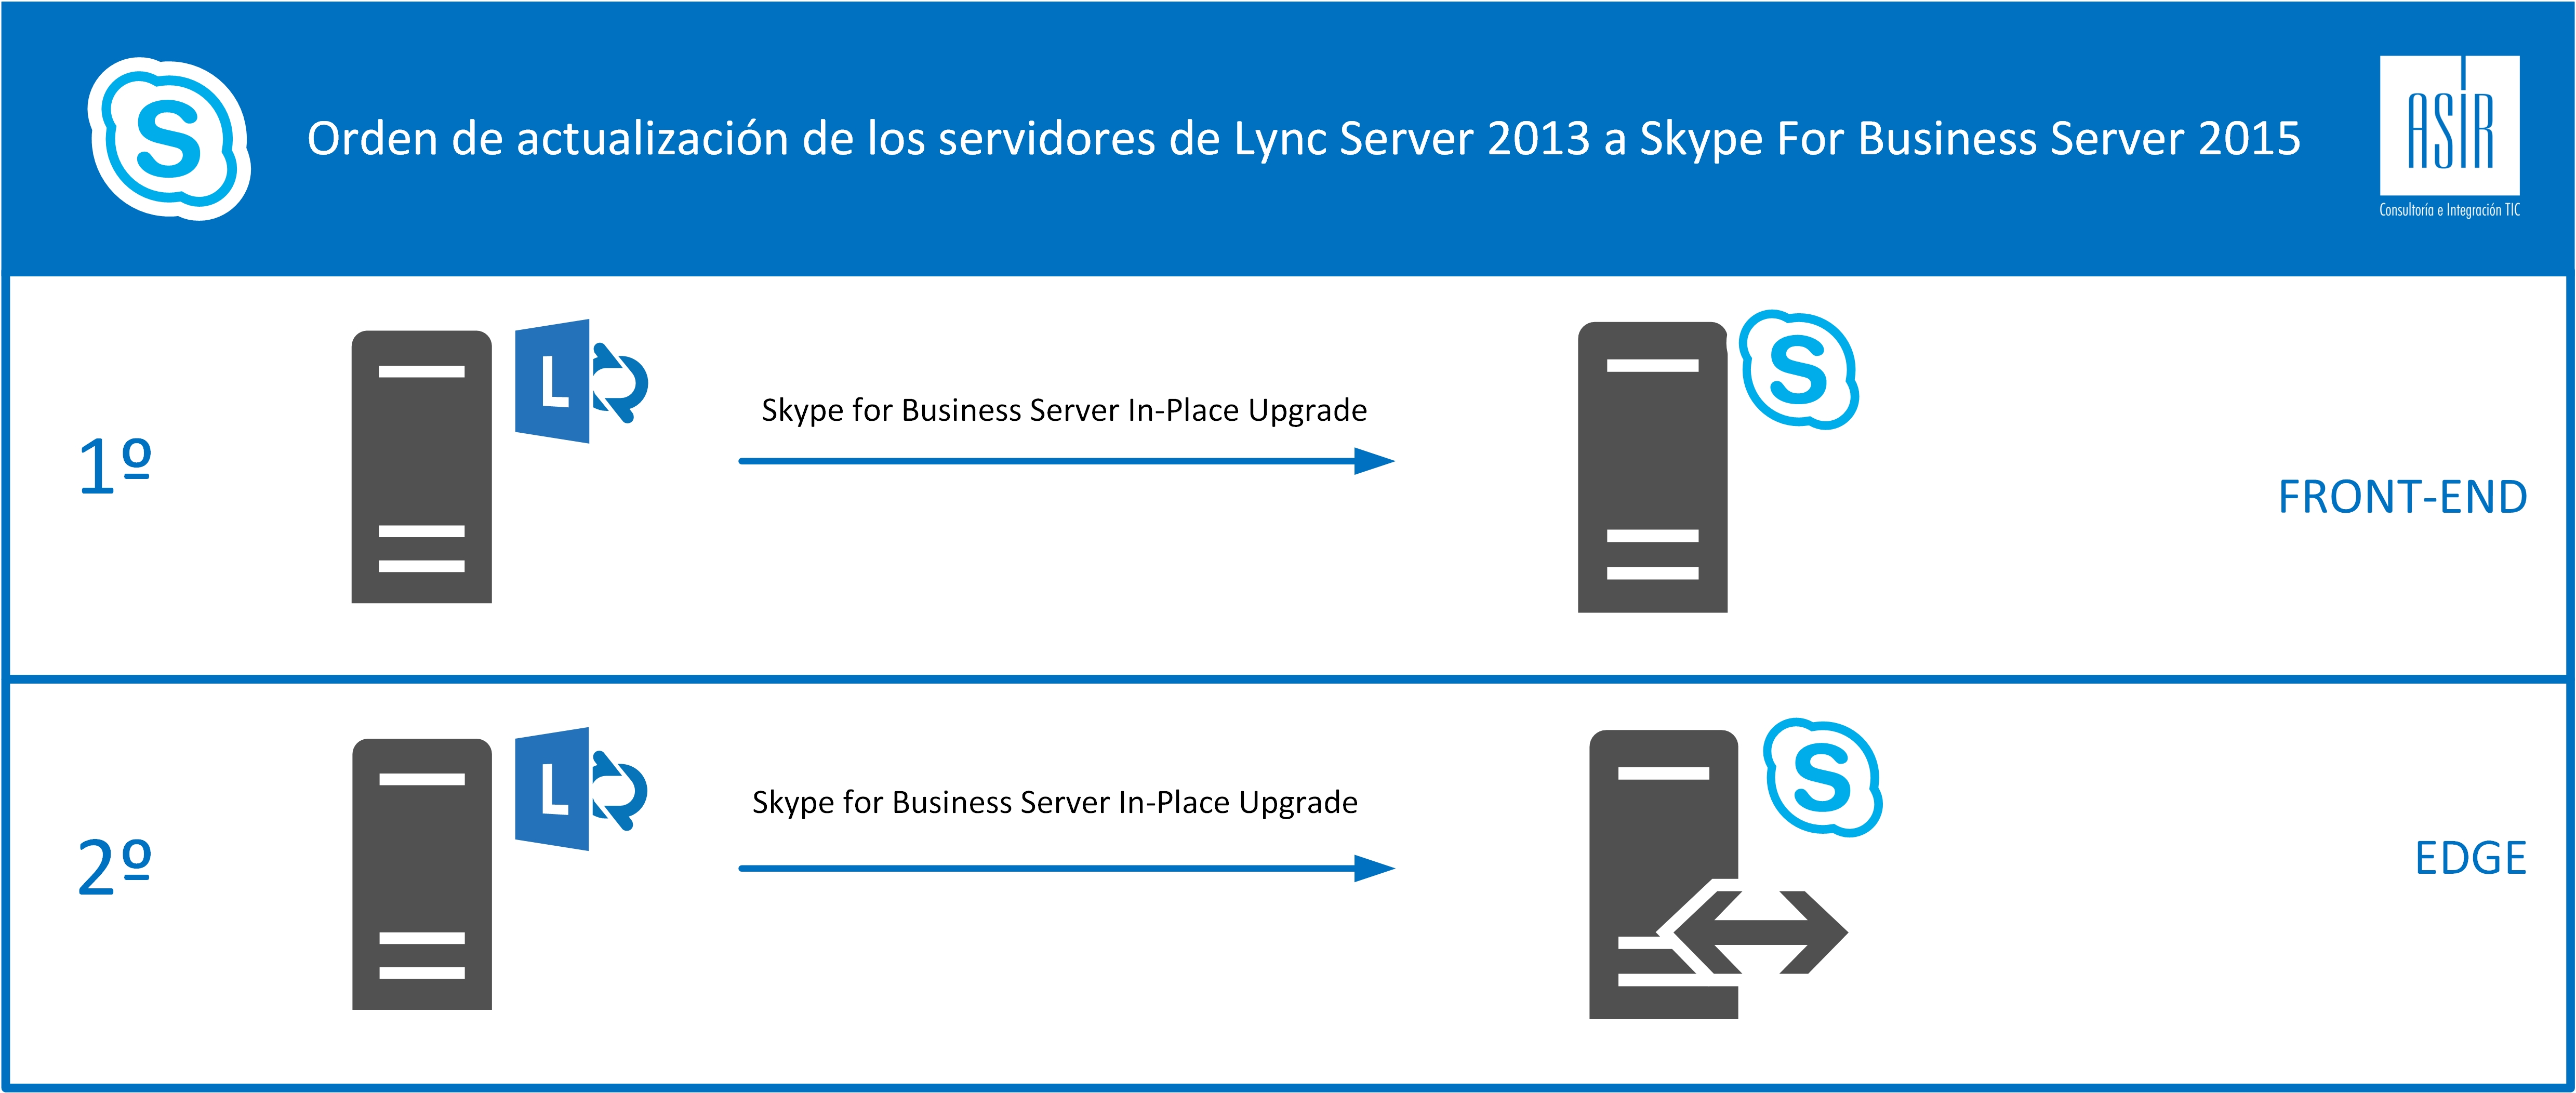 Migrar Lync Server 2013 ST a Skype4B ST_Topologia_Orden_Migracion.jpg